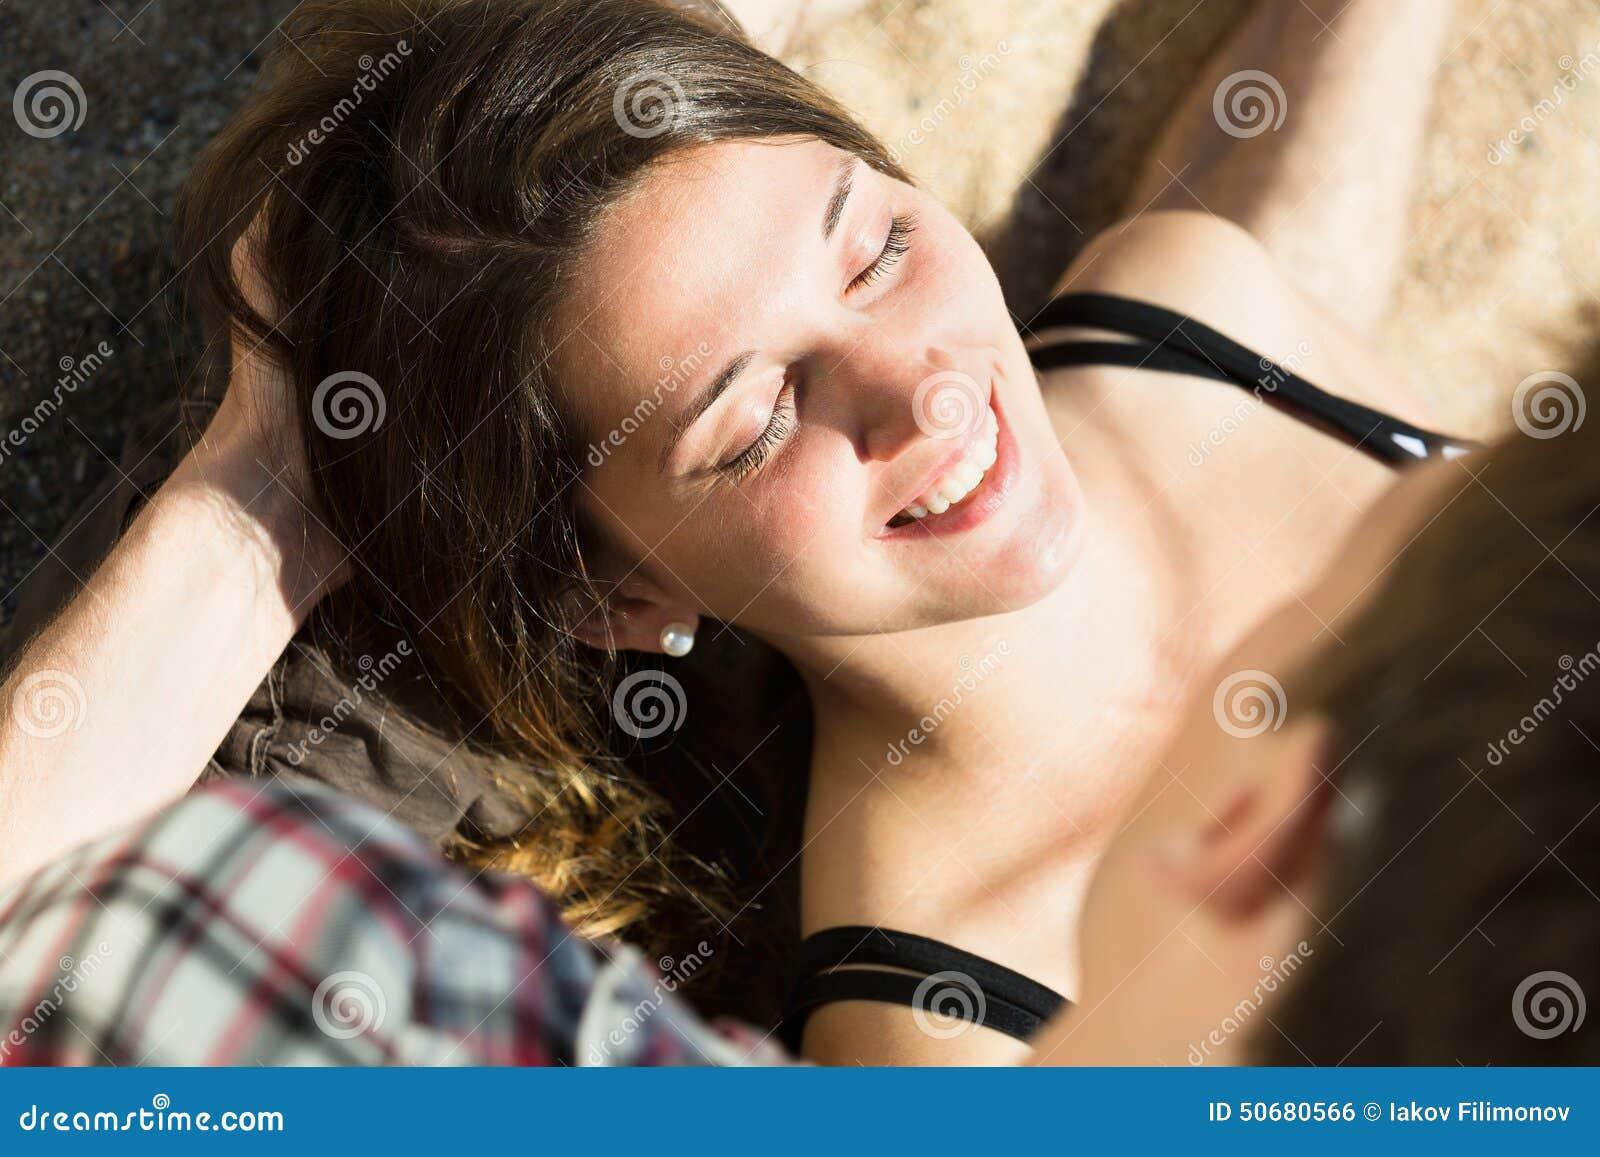 Download 女孩和她男朋友微笑 库存照片. 图片 包括有 人员, 人们, 幸福, 享用, 自由, 乐趣, 感觉, 女性 - 50680566